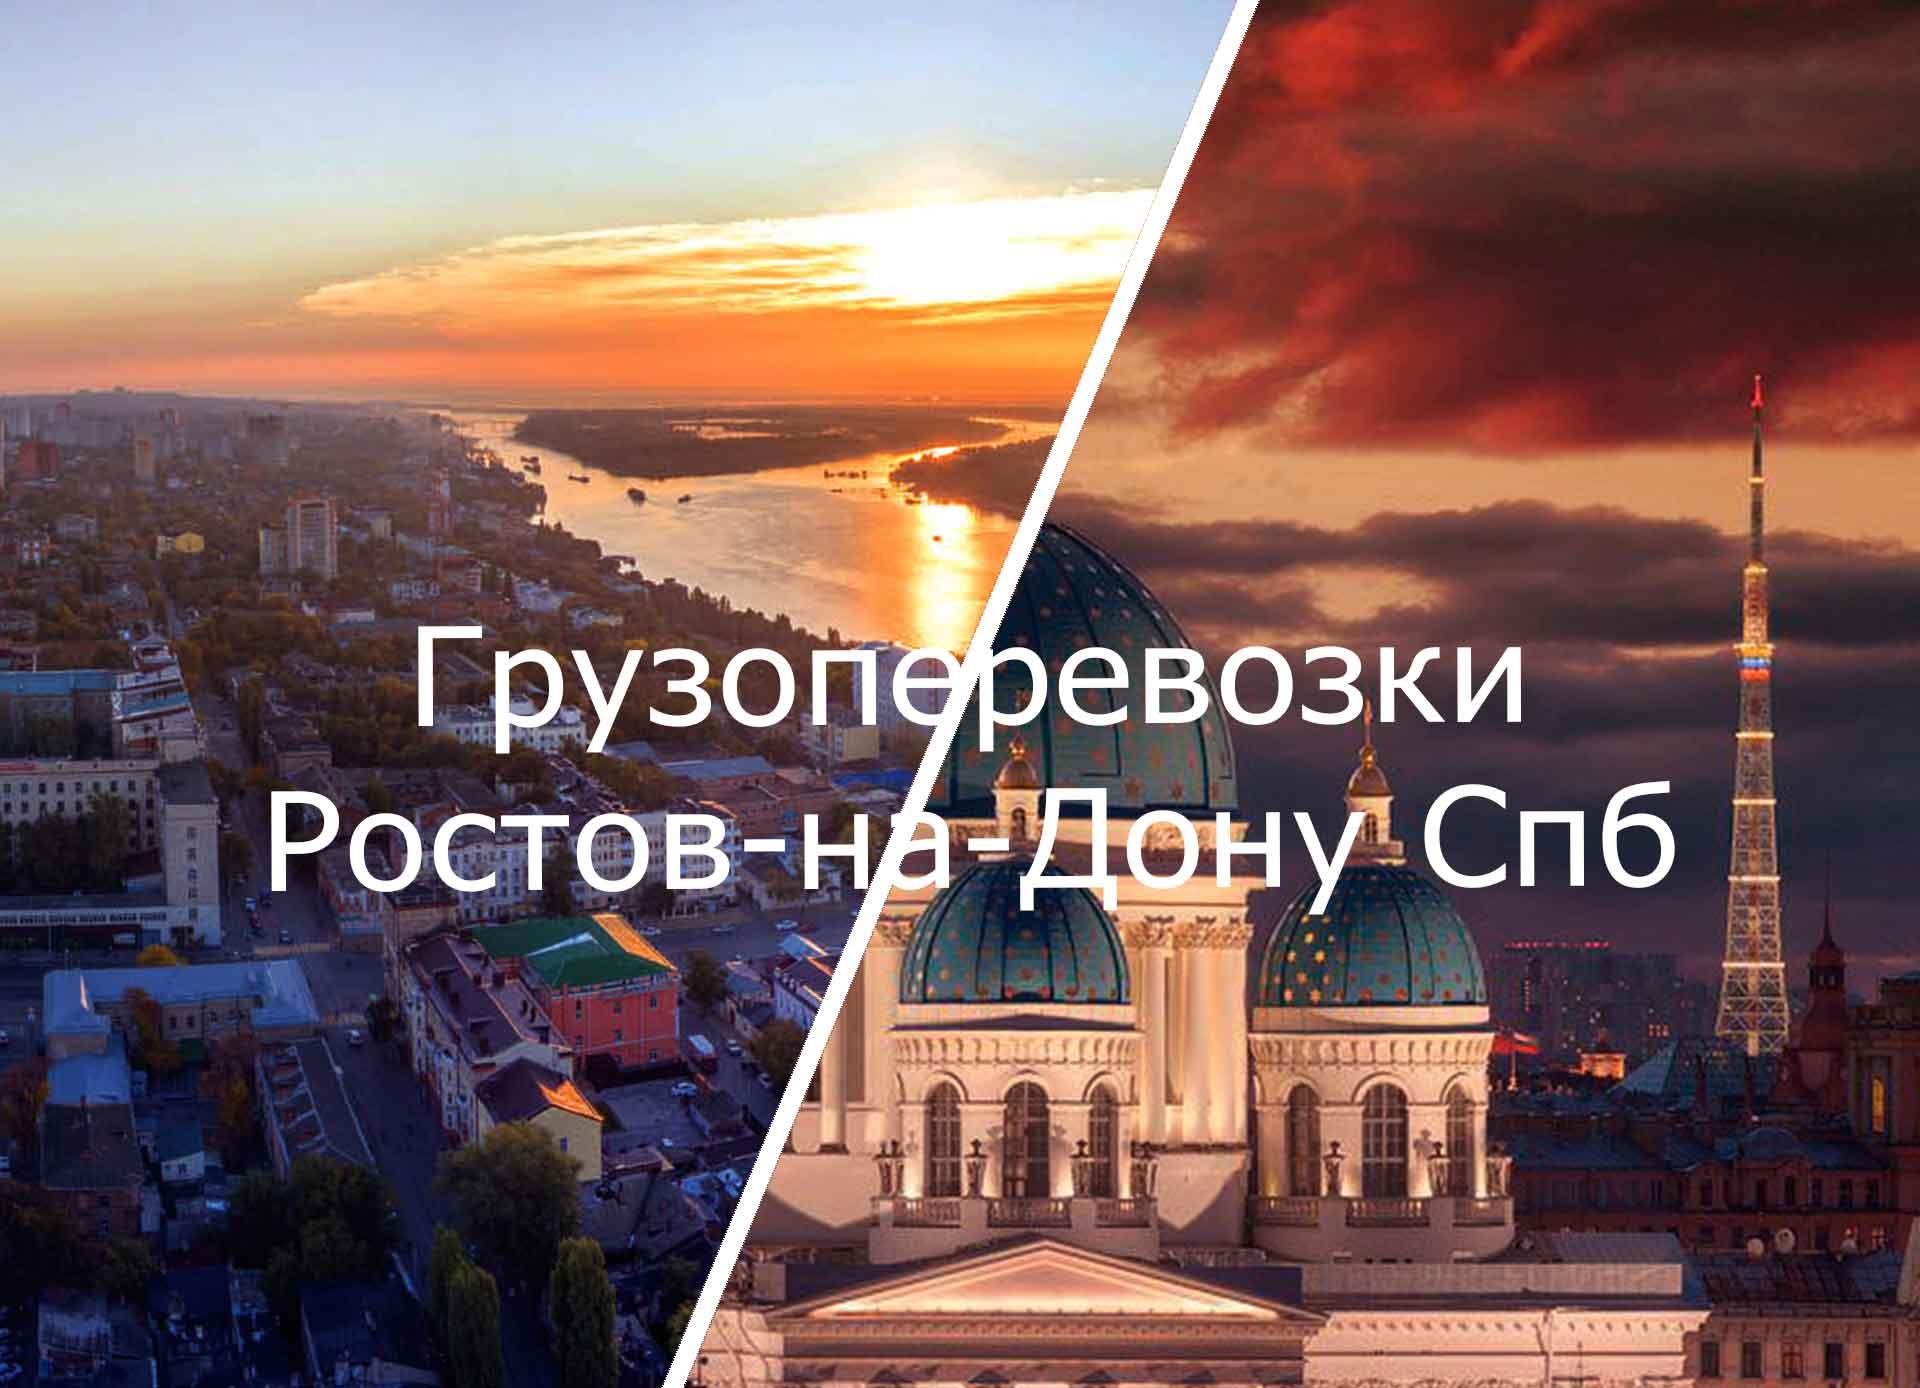 грузоперевозки ростов на дону санкт петербург